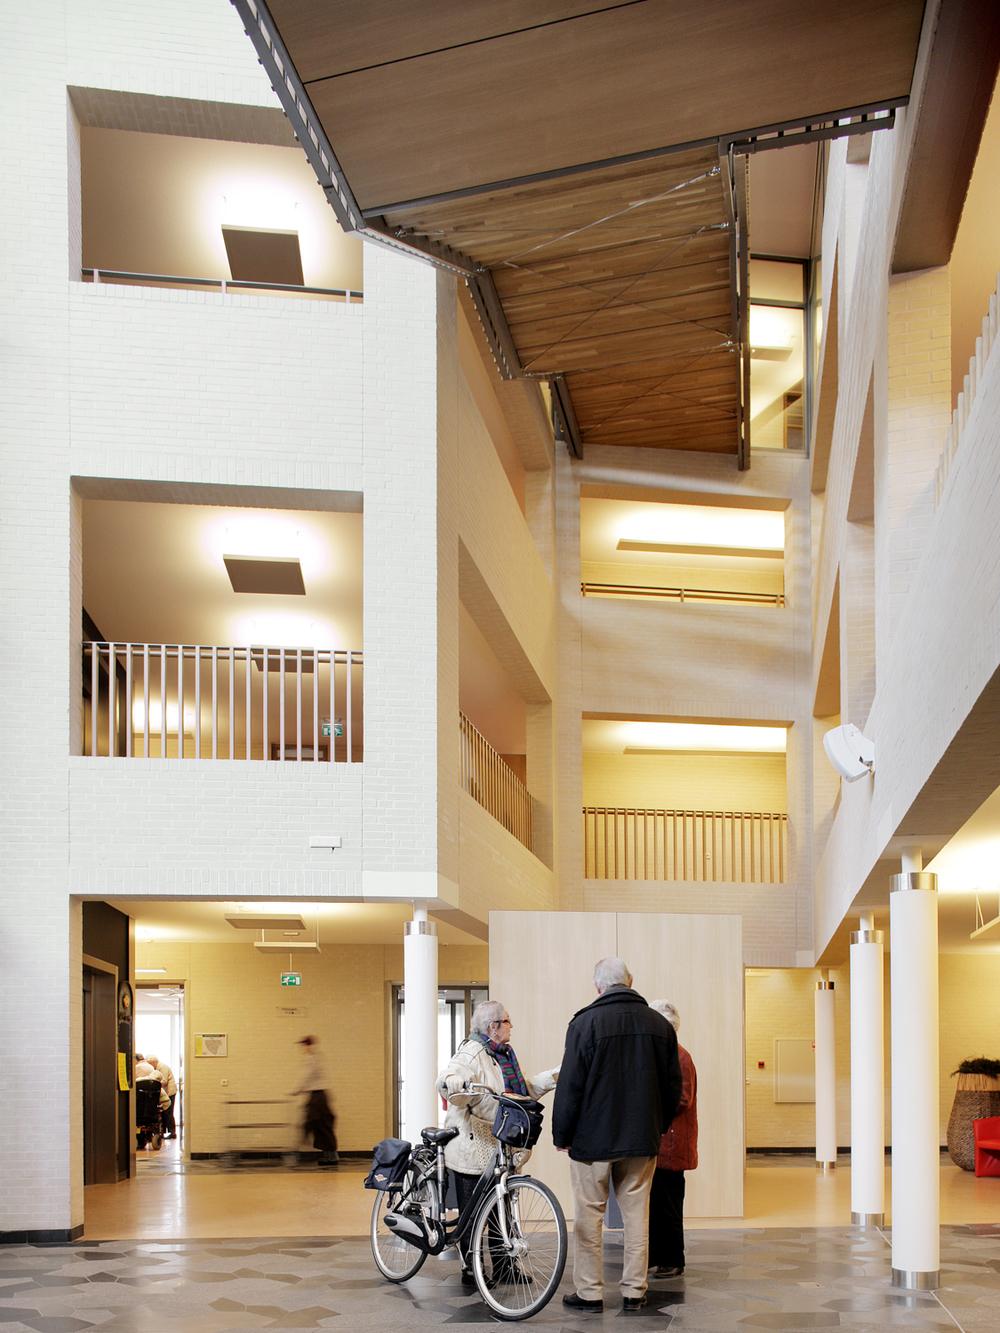 Woonzorgcentrum De Venloene in Loon op Zand